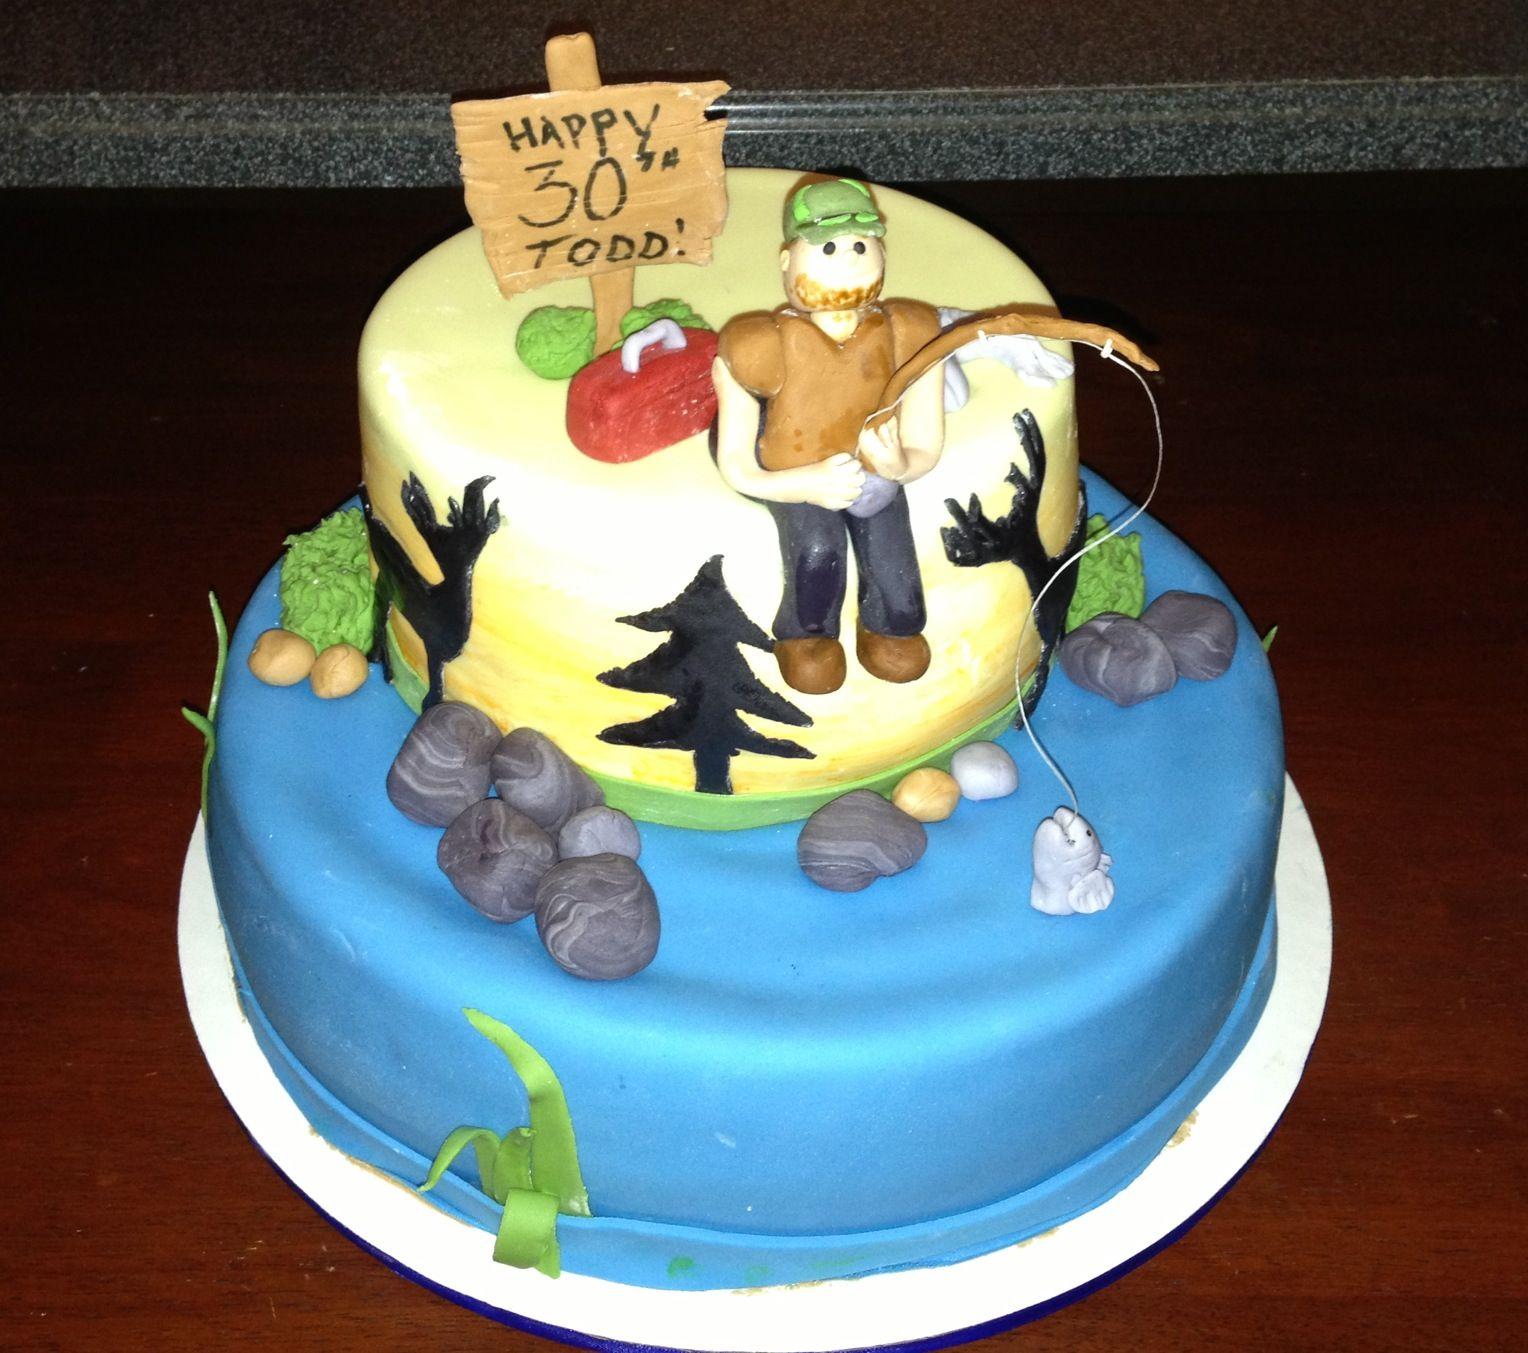 My Husbands 30th Birthday Cake Food Birthday Cake For Husband